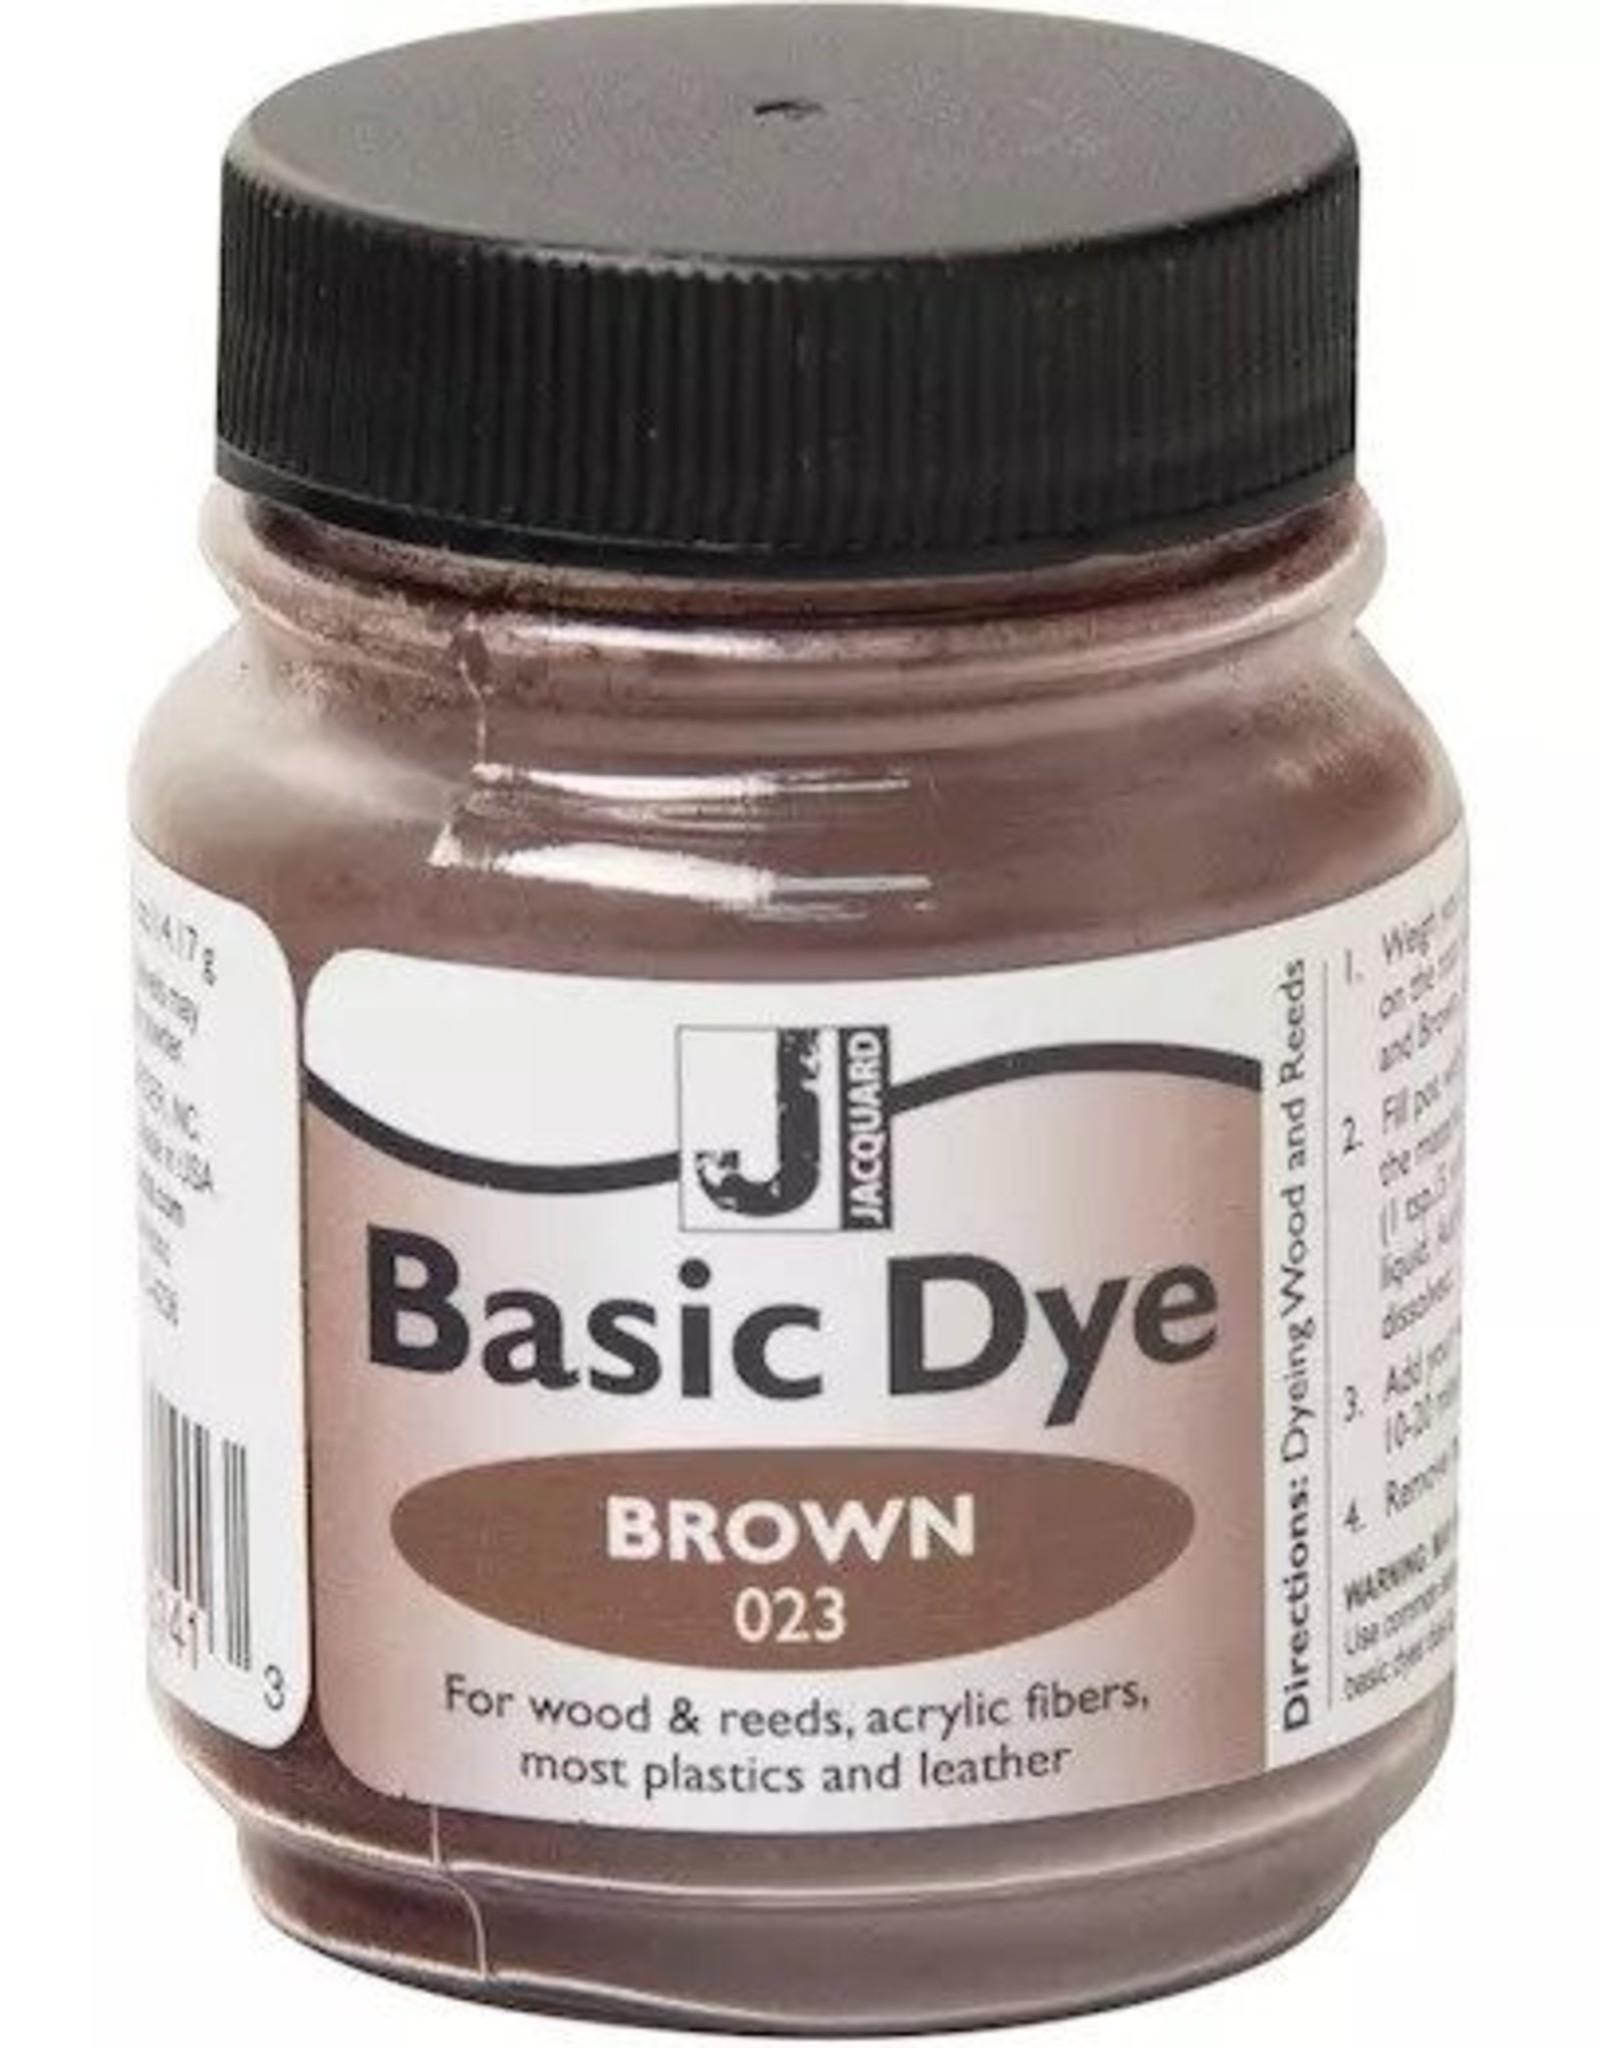 Jacquard Jacquard Basic Dye Brown